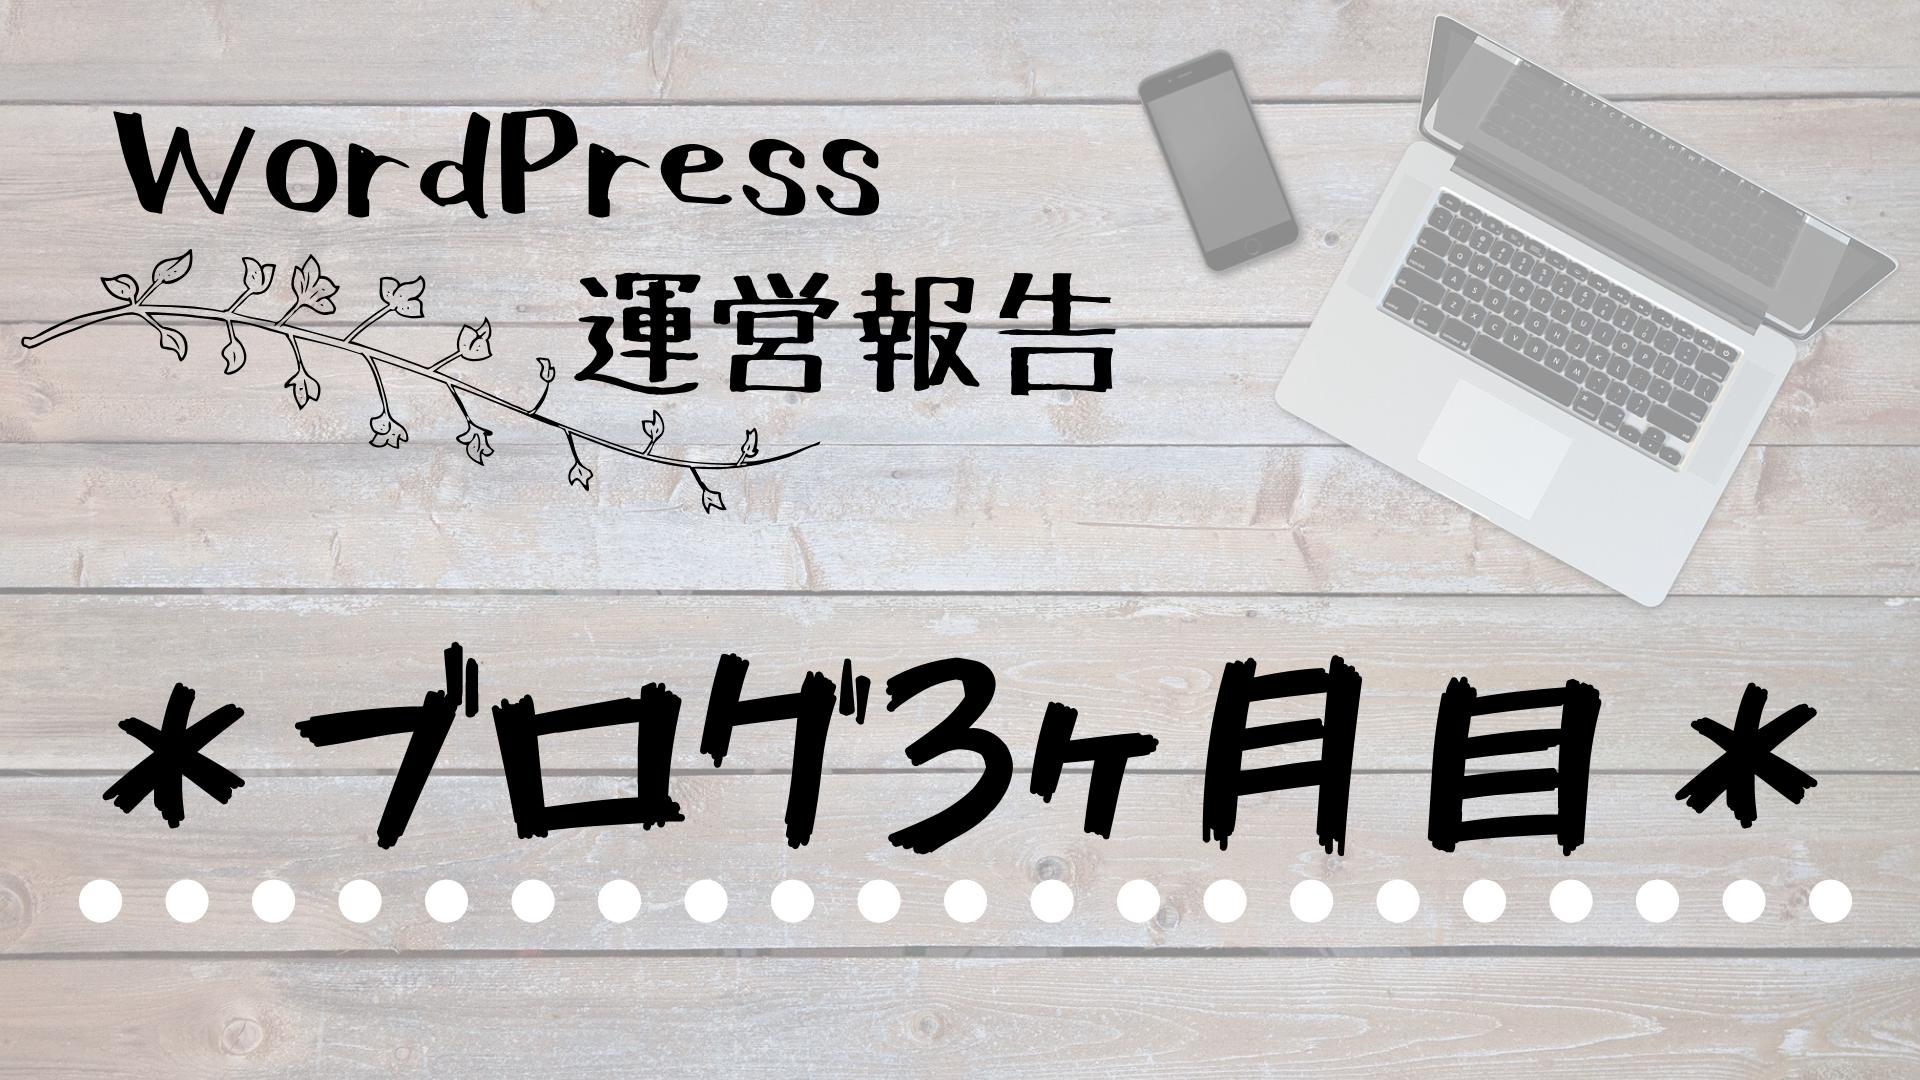 WordPress3か月